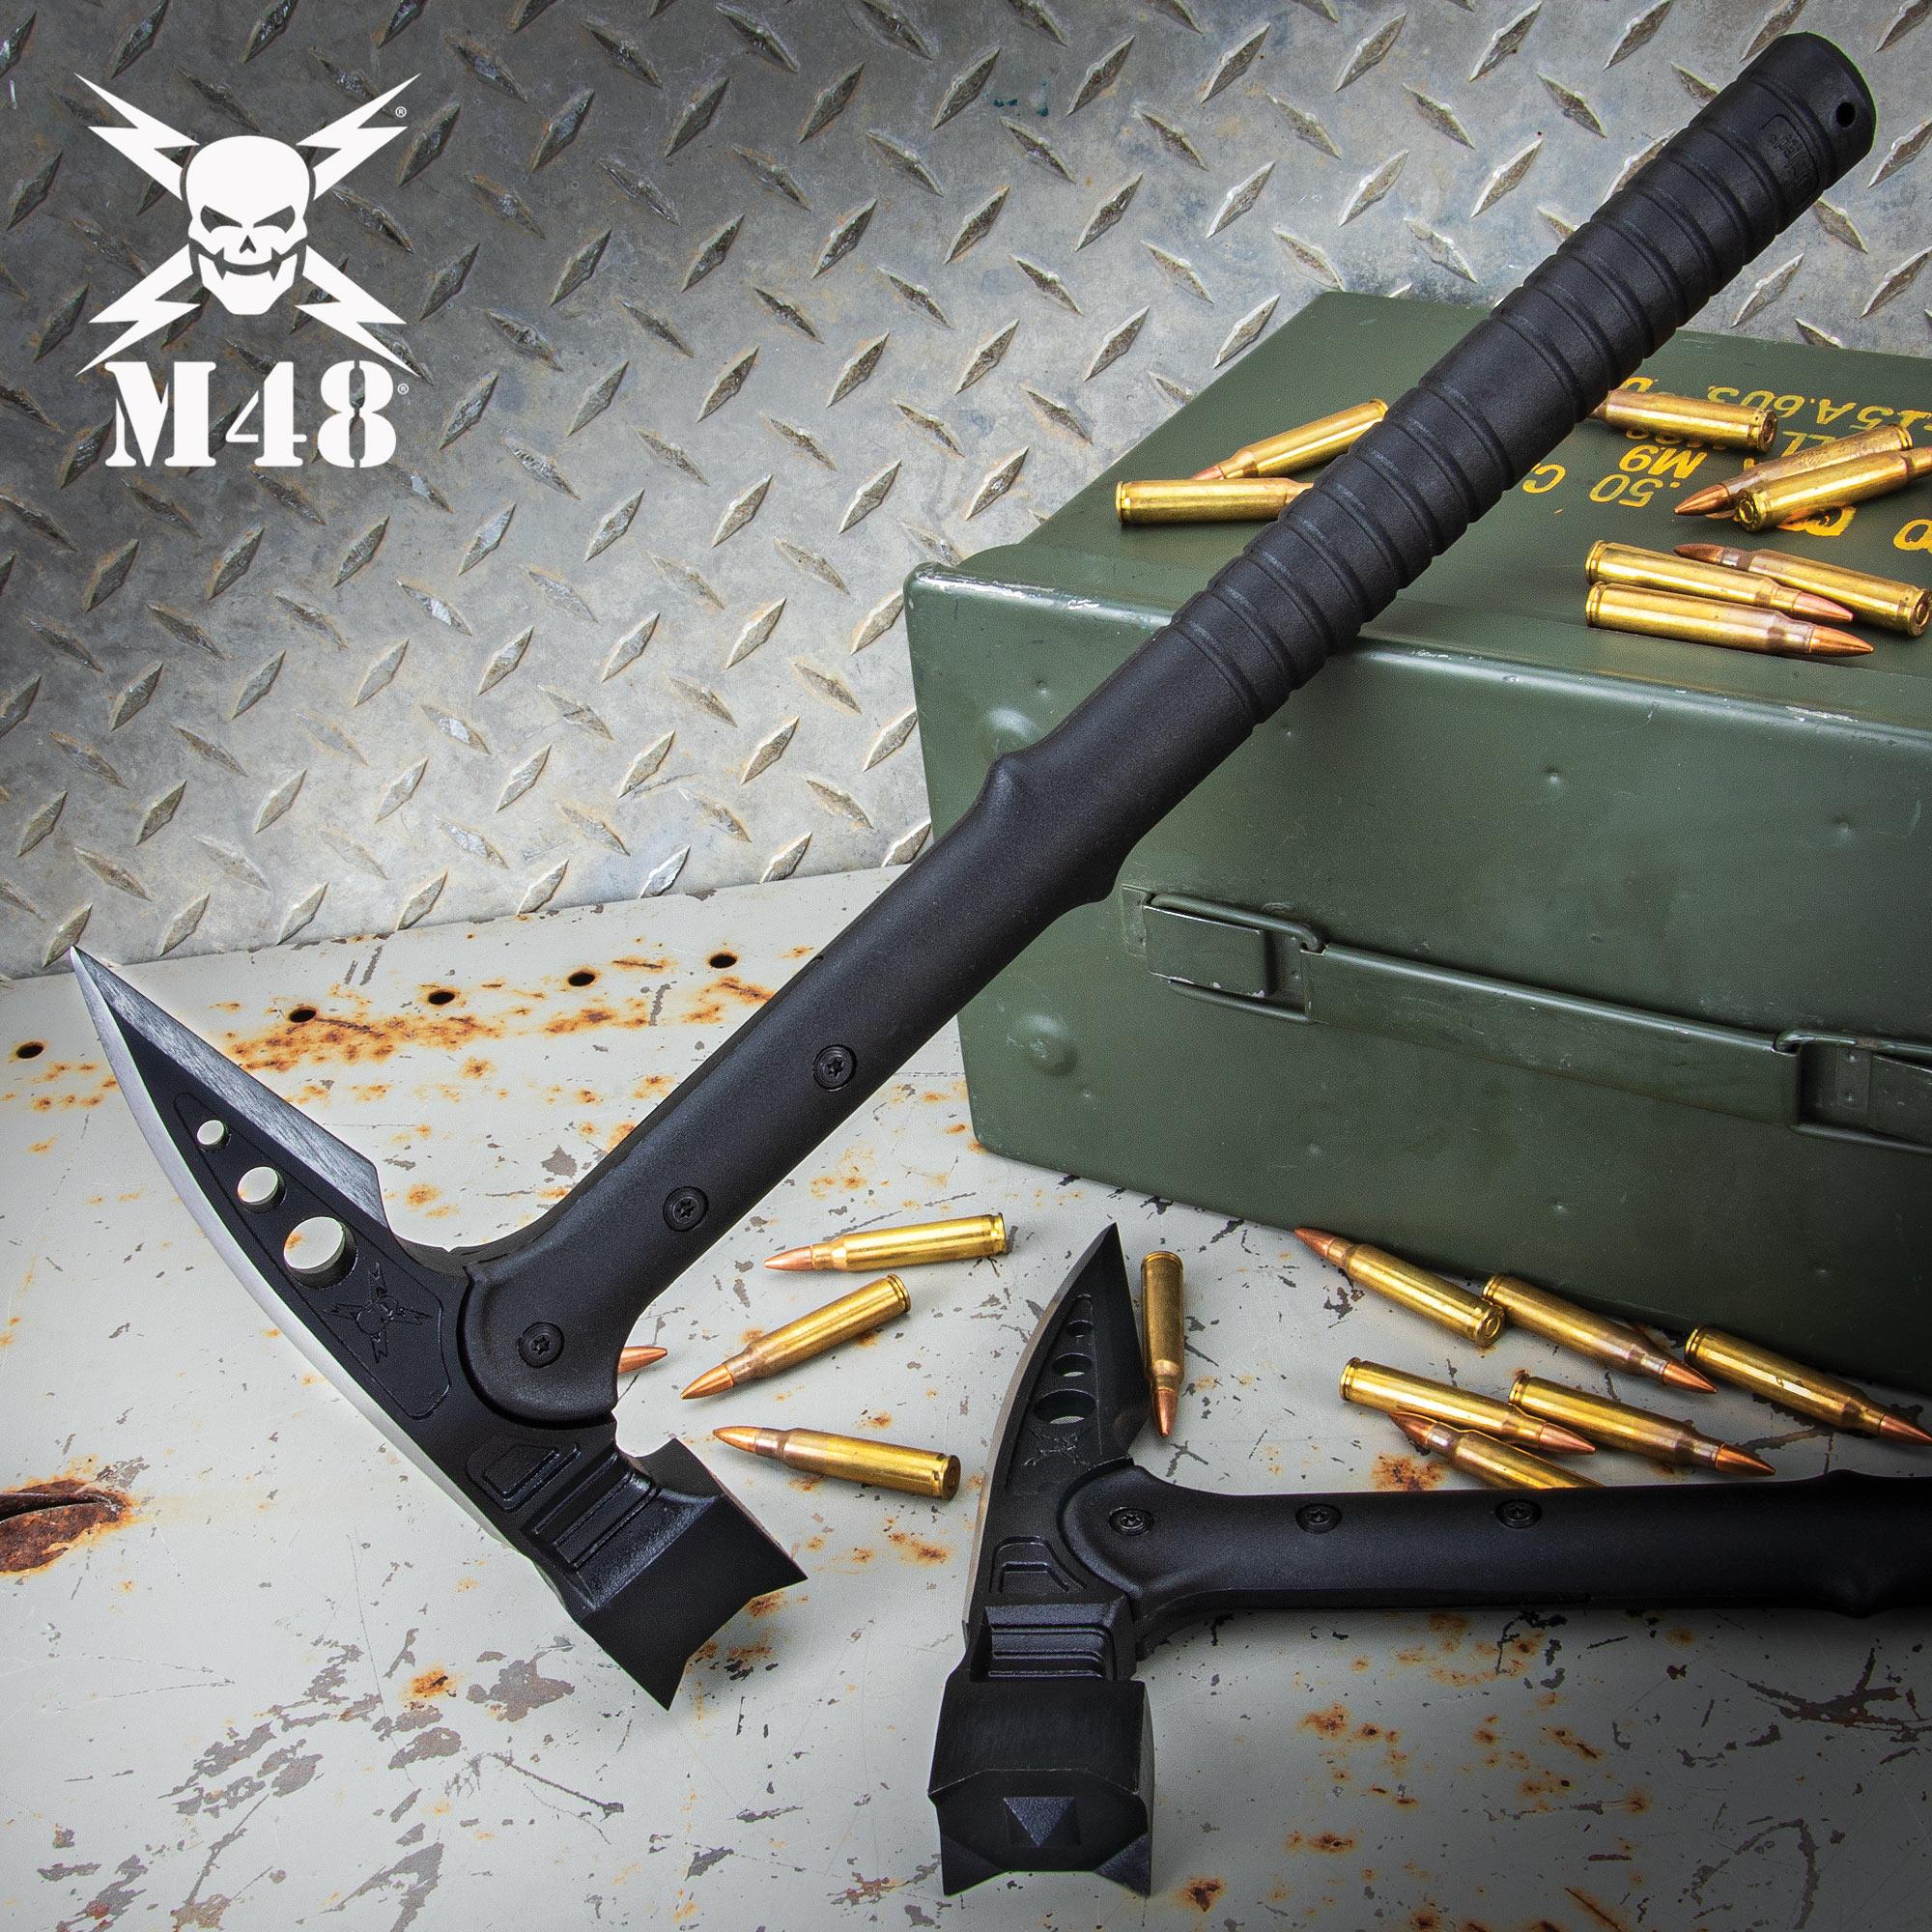 M48 Tactical Hammer